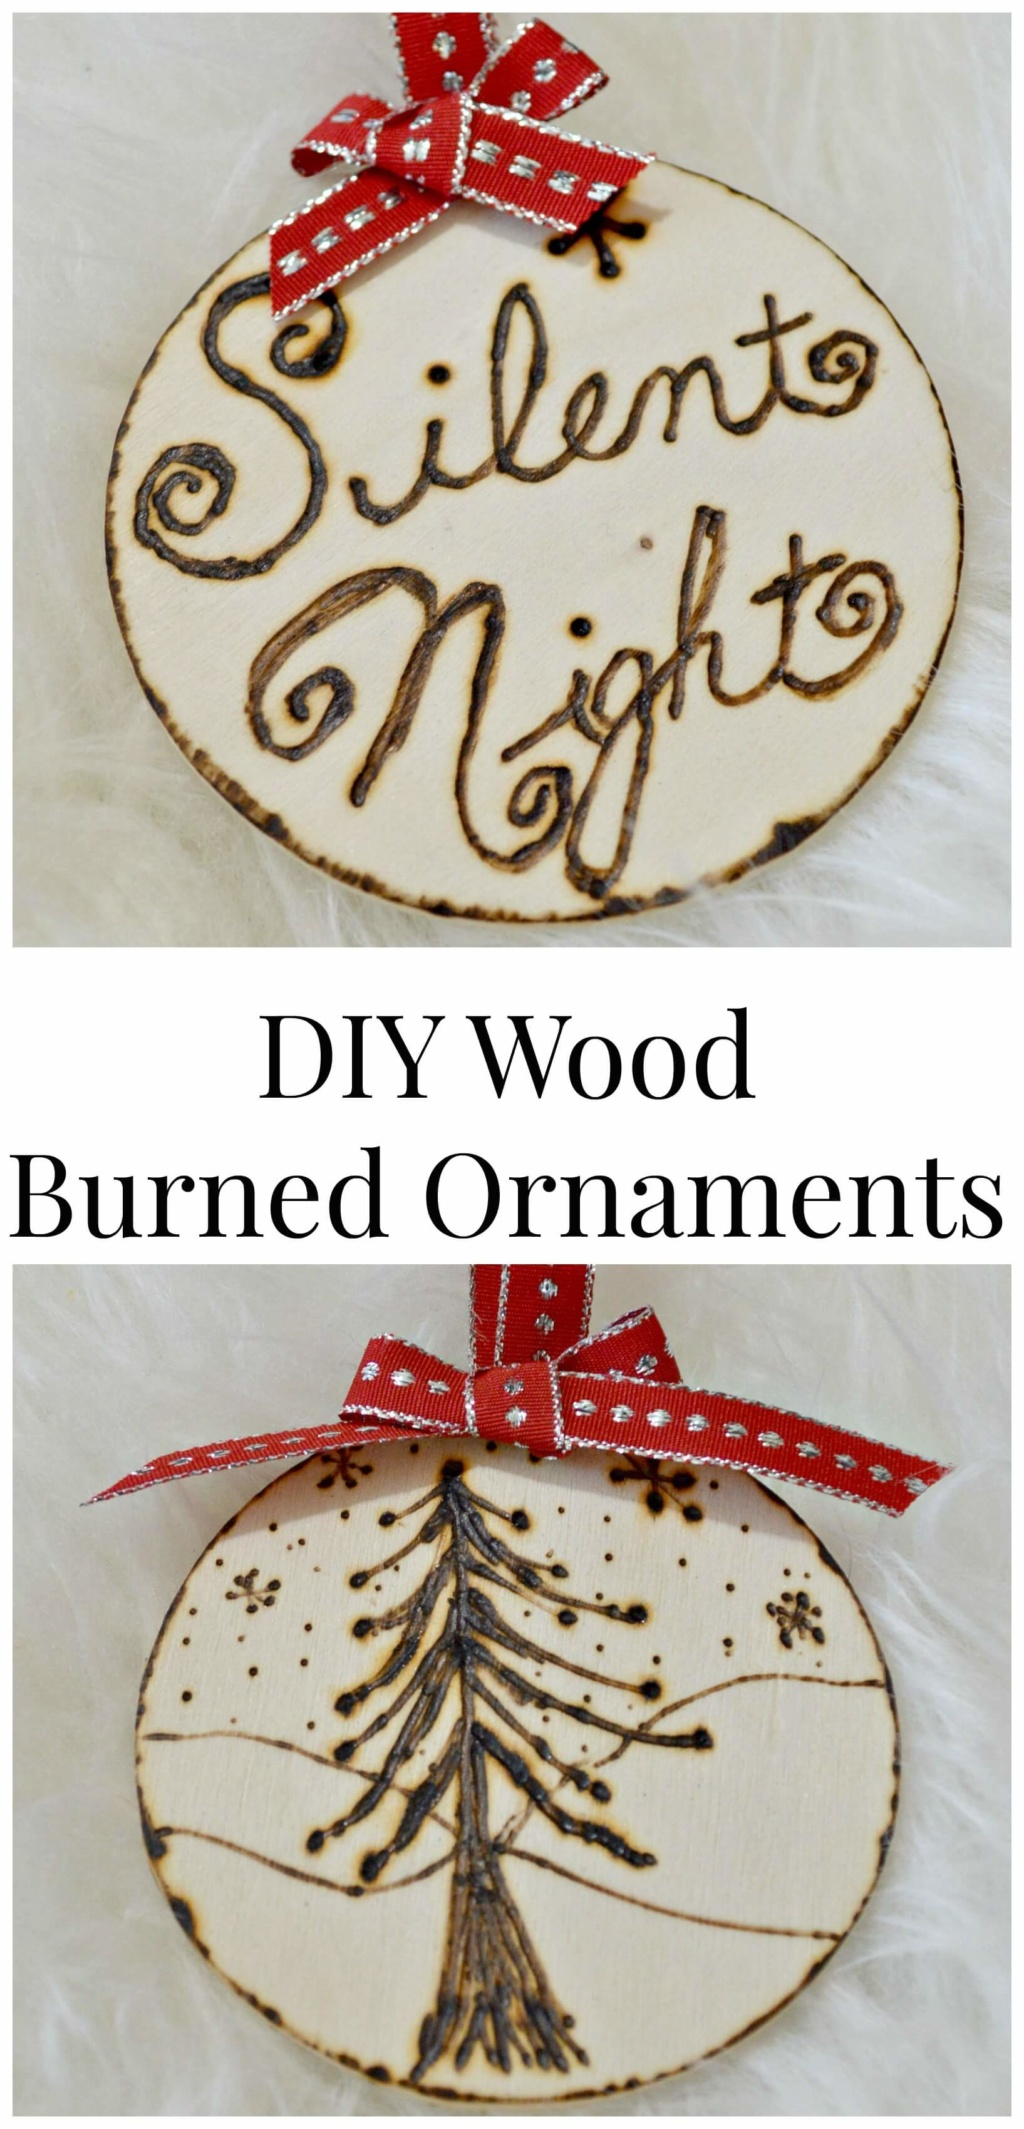 DIY Wood Burned Ornaments